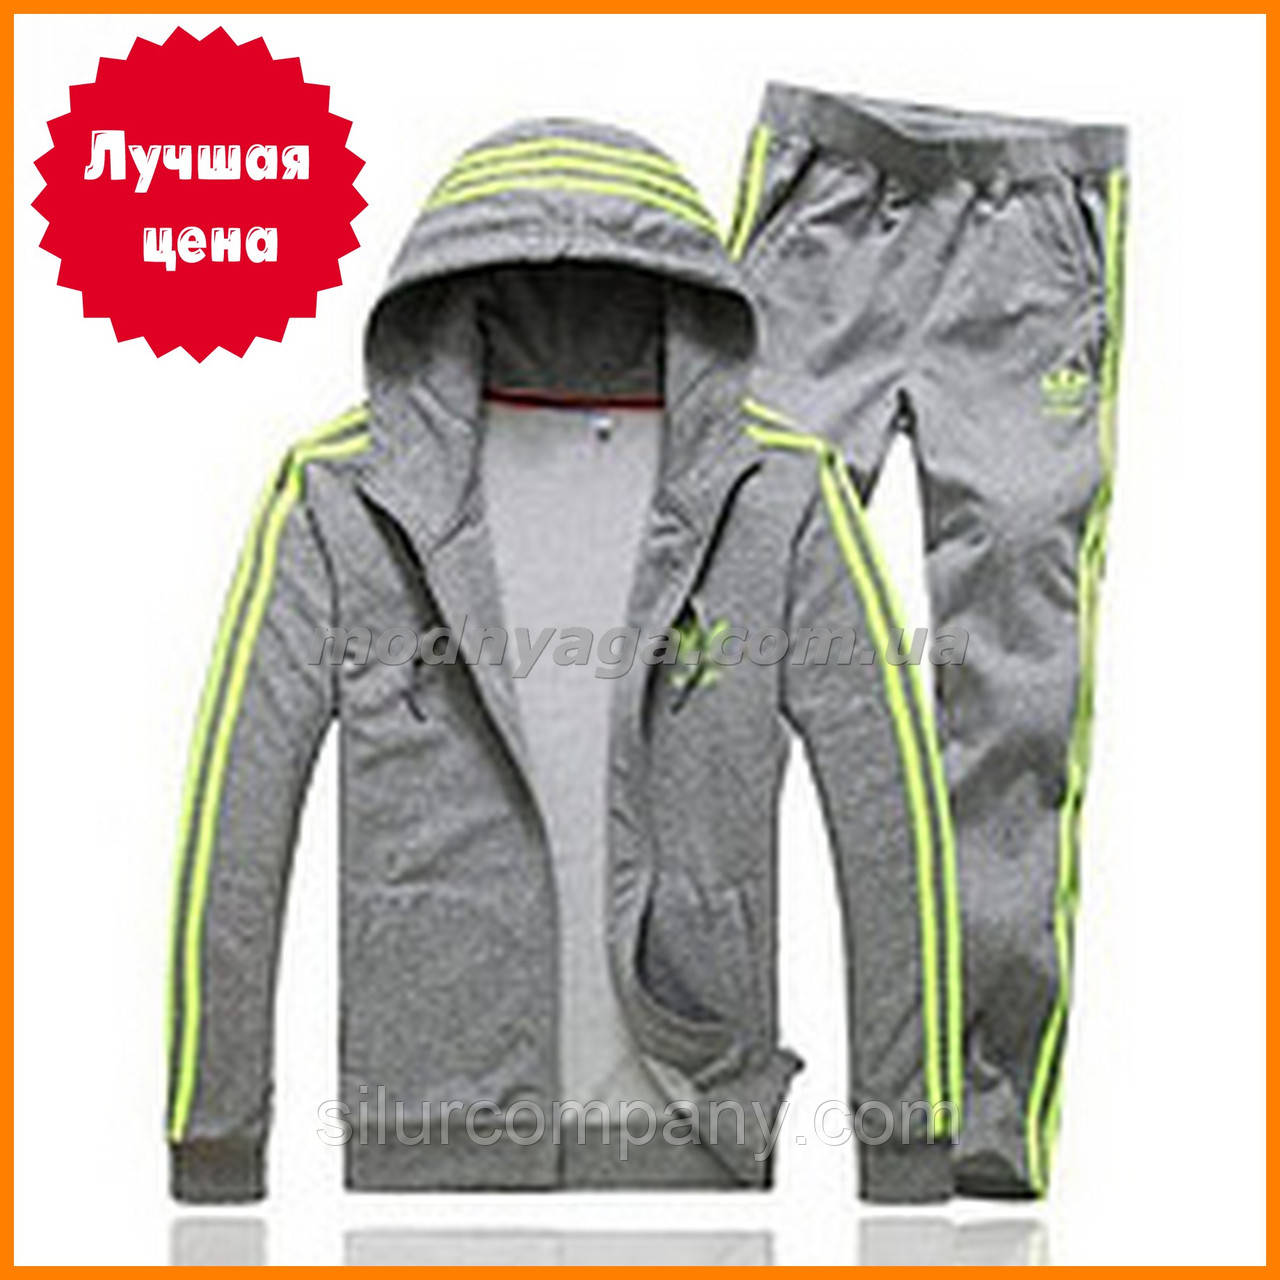 Брендовая детская спортивная форма  продажа 09b68e432a28e